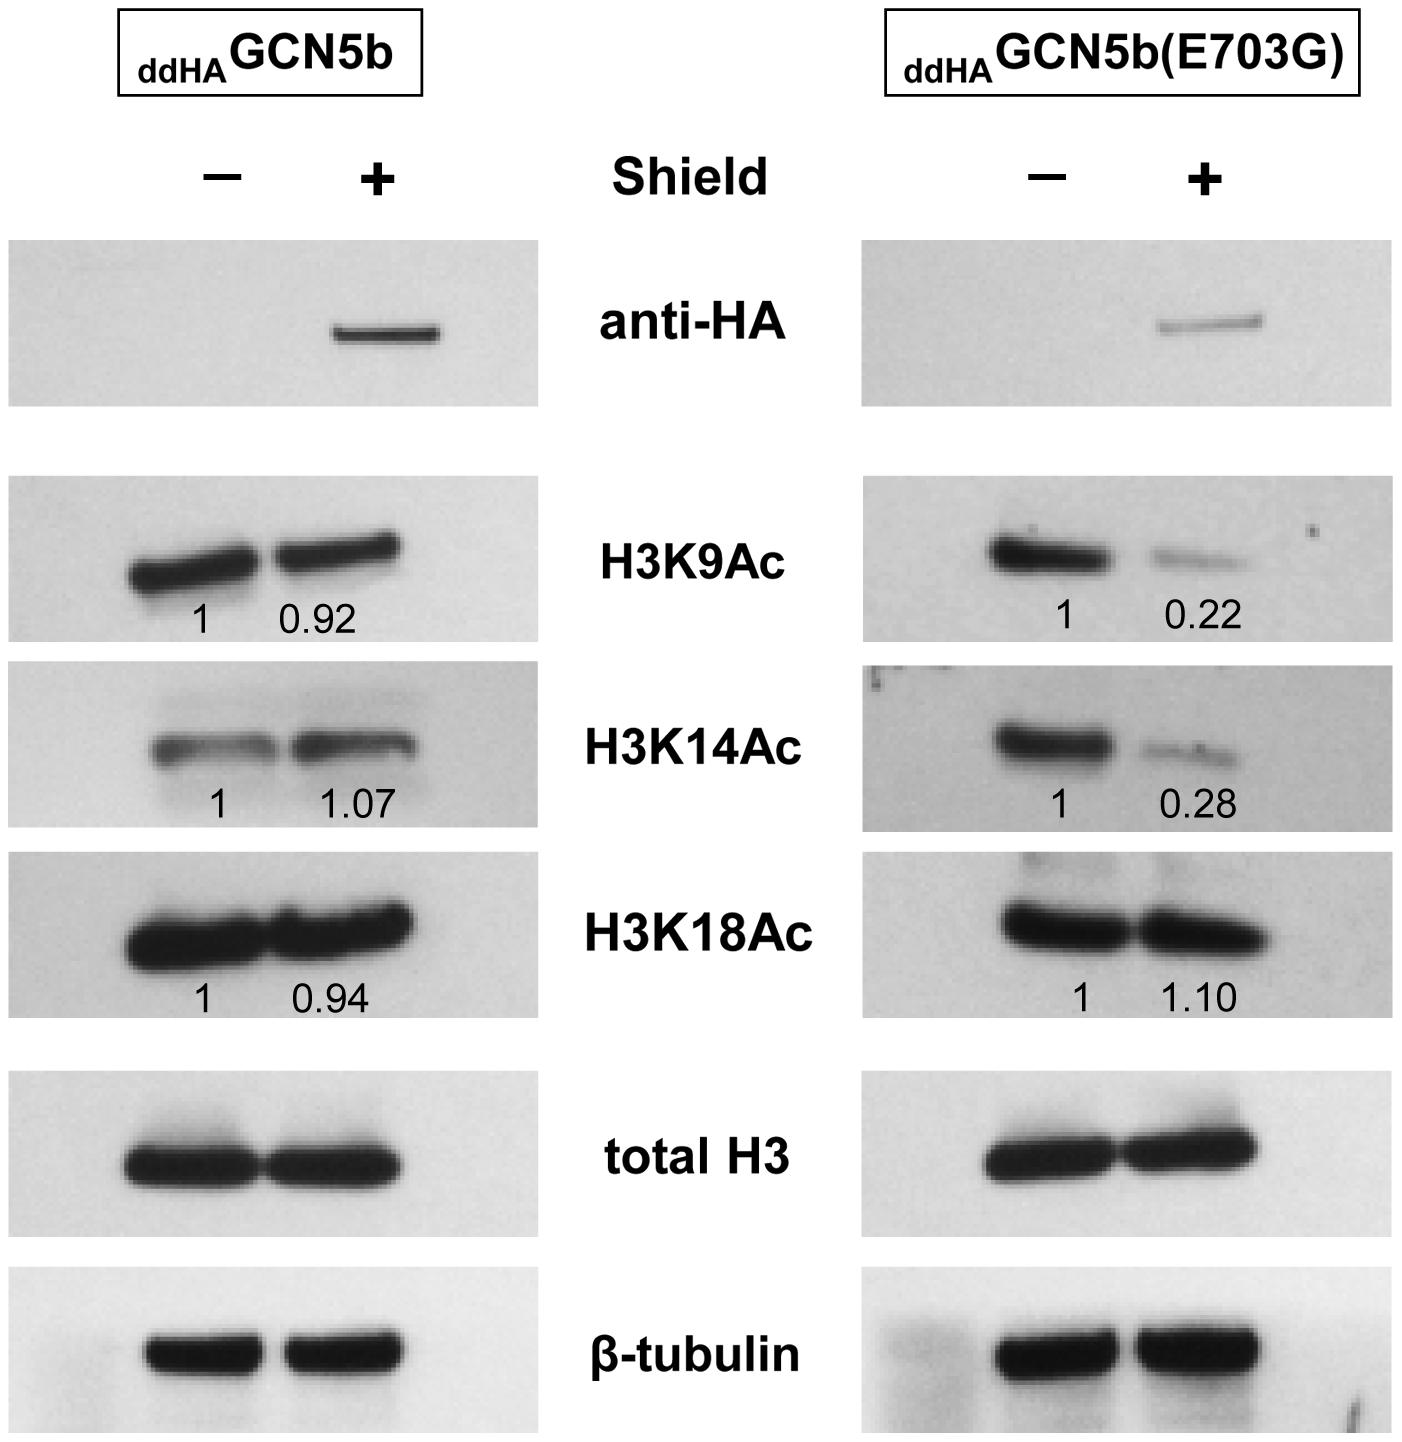 Reduced histone H3 acetylation in <sub>ddHA</sub>GCN5b(E703G) parasites.